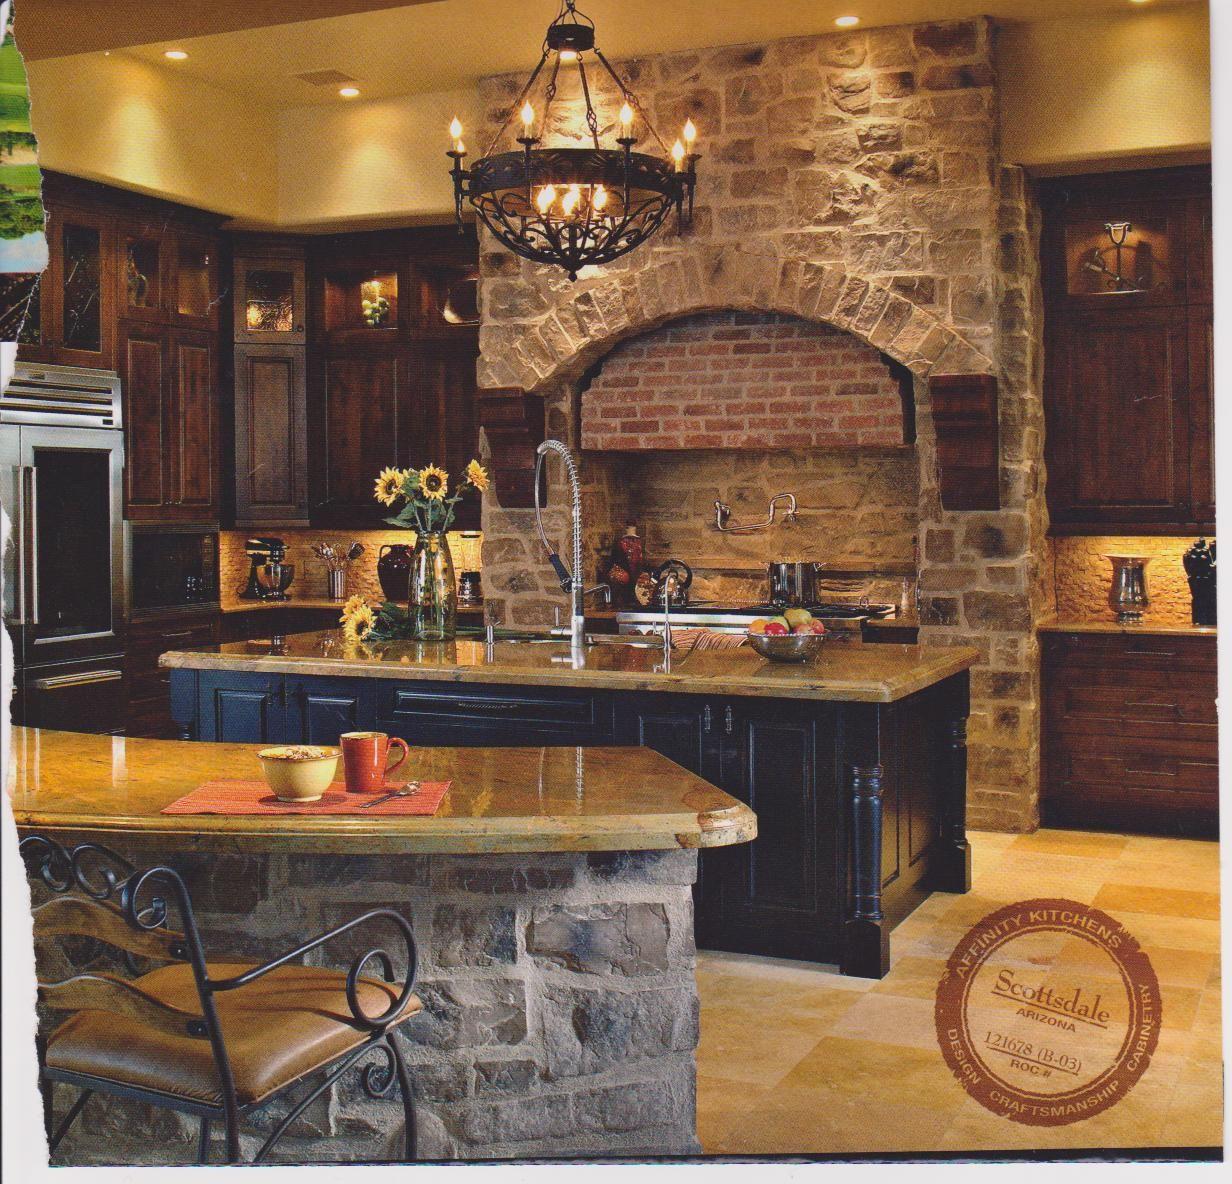 Old world kitchen design kitchen of my dreams pinterest for Kitchen designs old world style